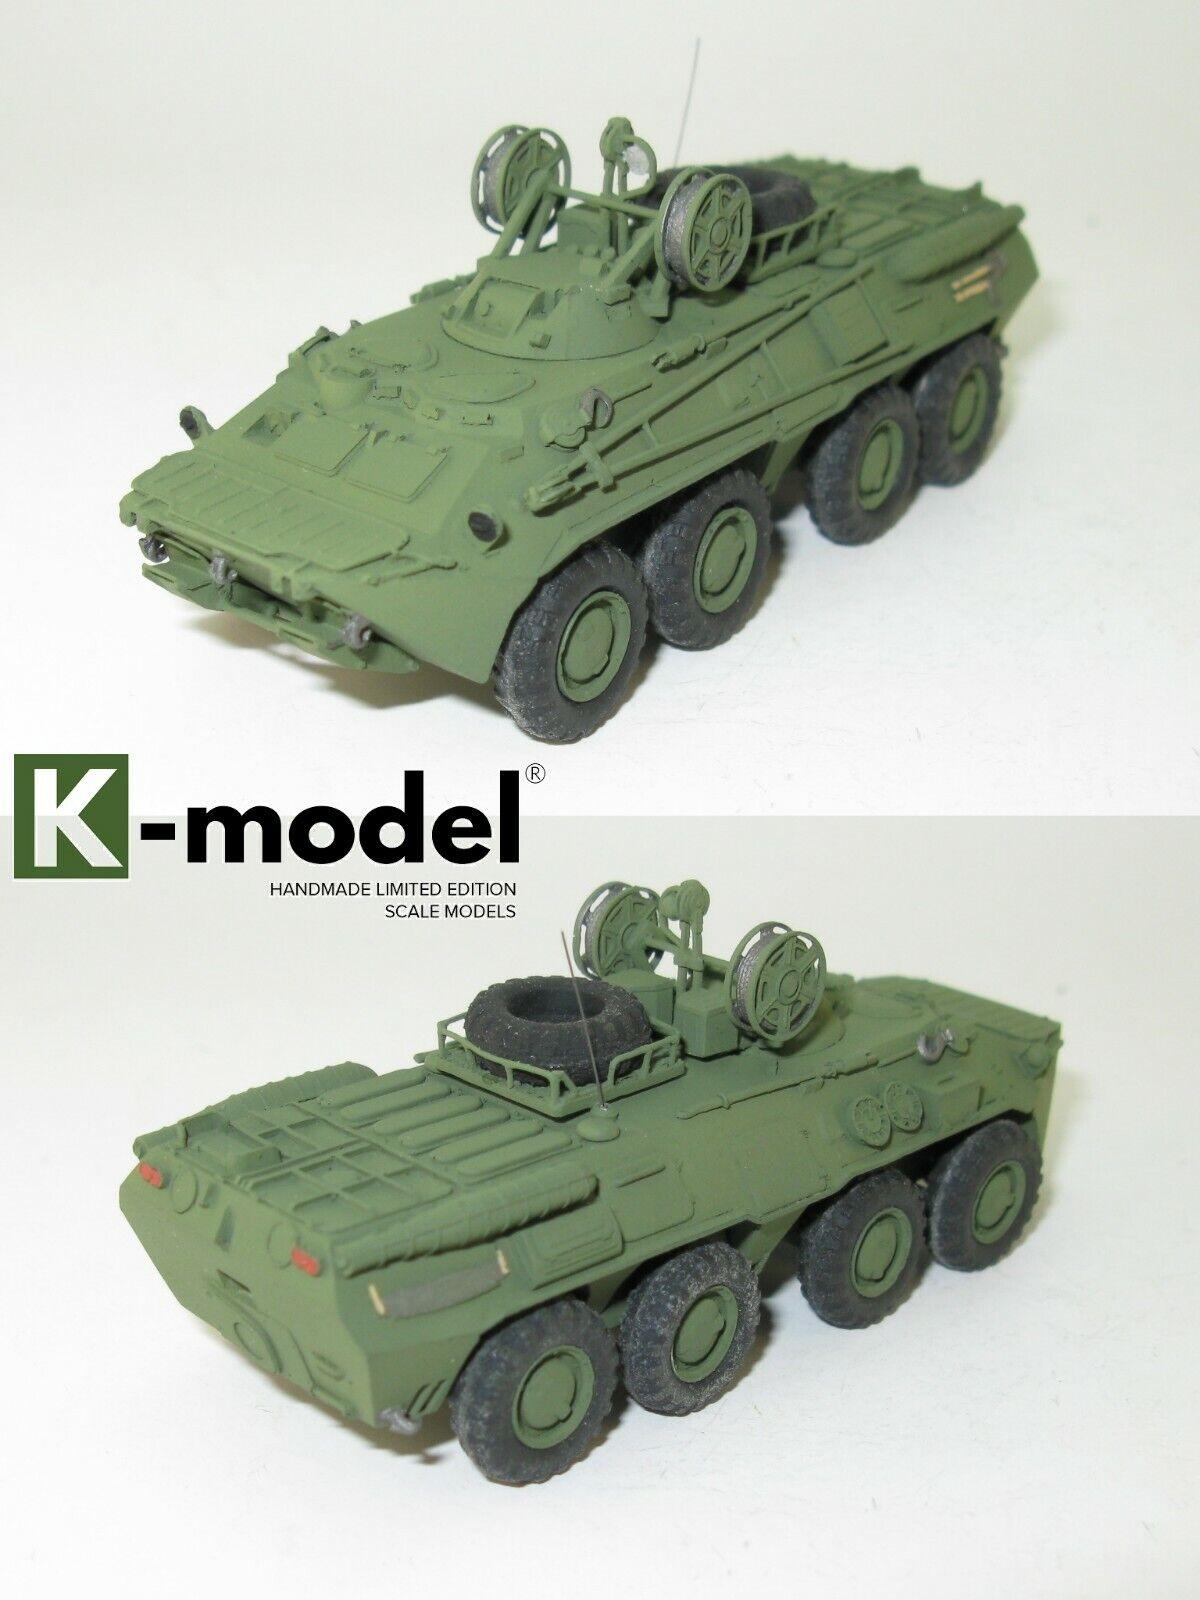 BREM-K Swimming Mountains Tank Base BTR-80 (1988) SPW Army UdSSR - 1 87 HO